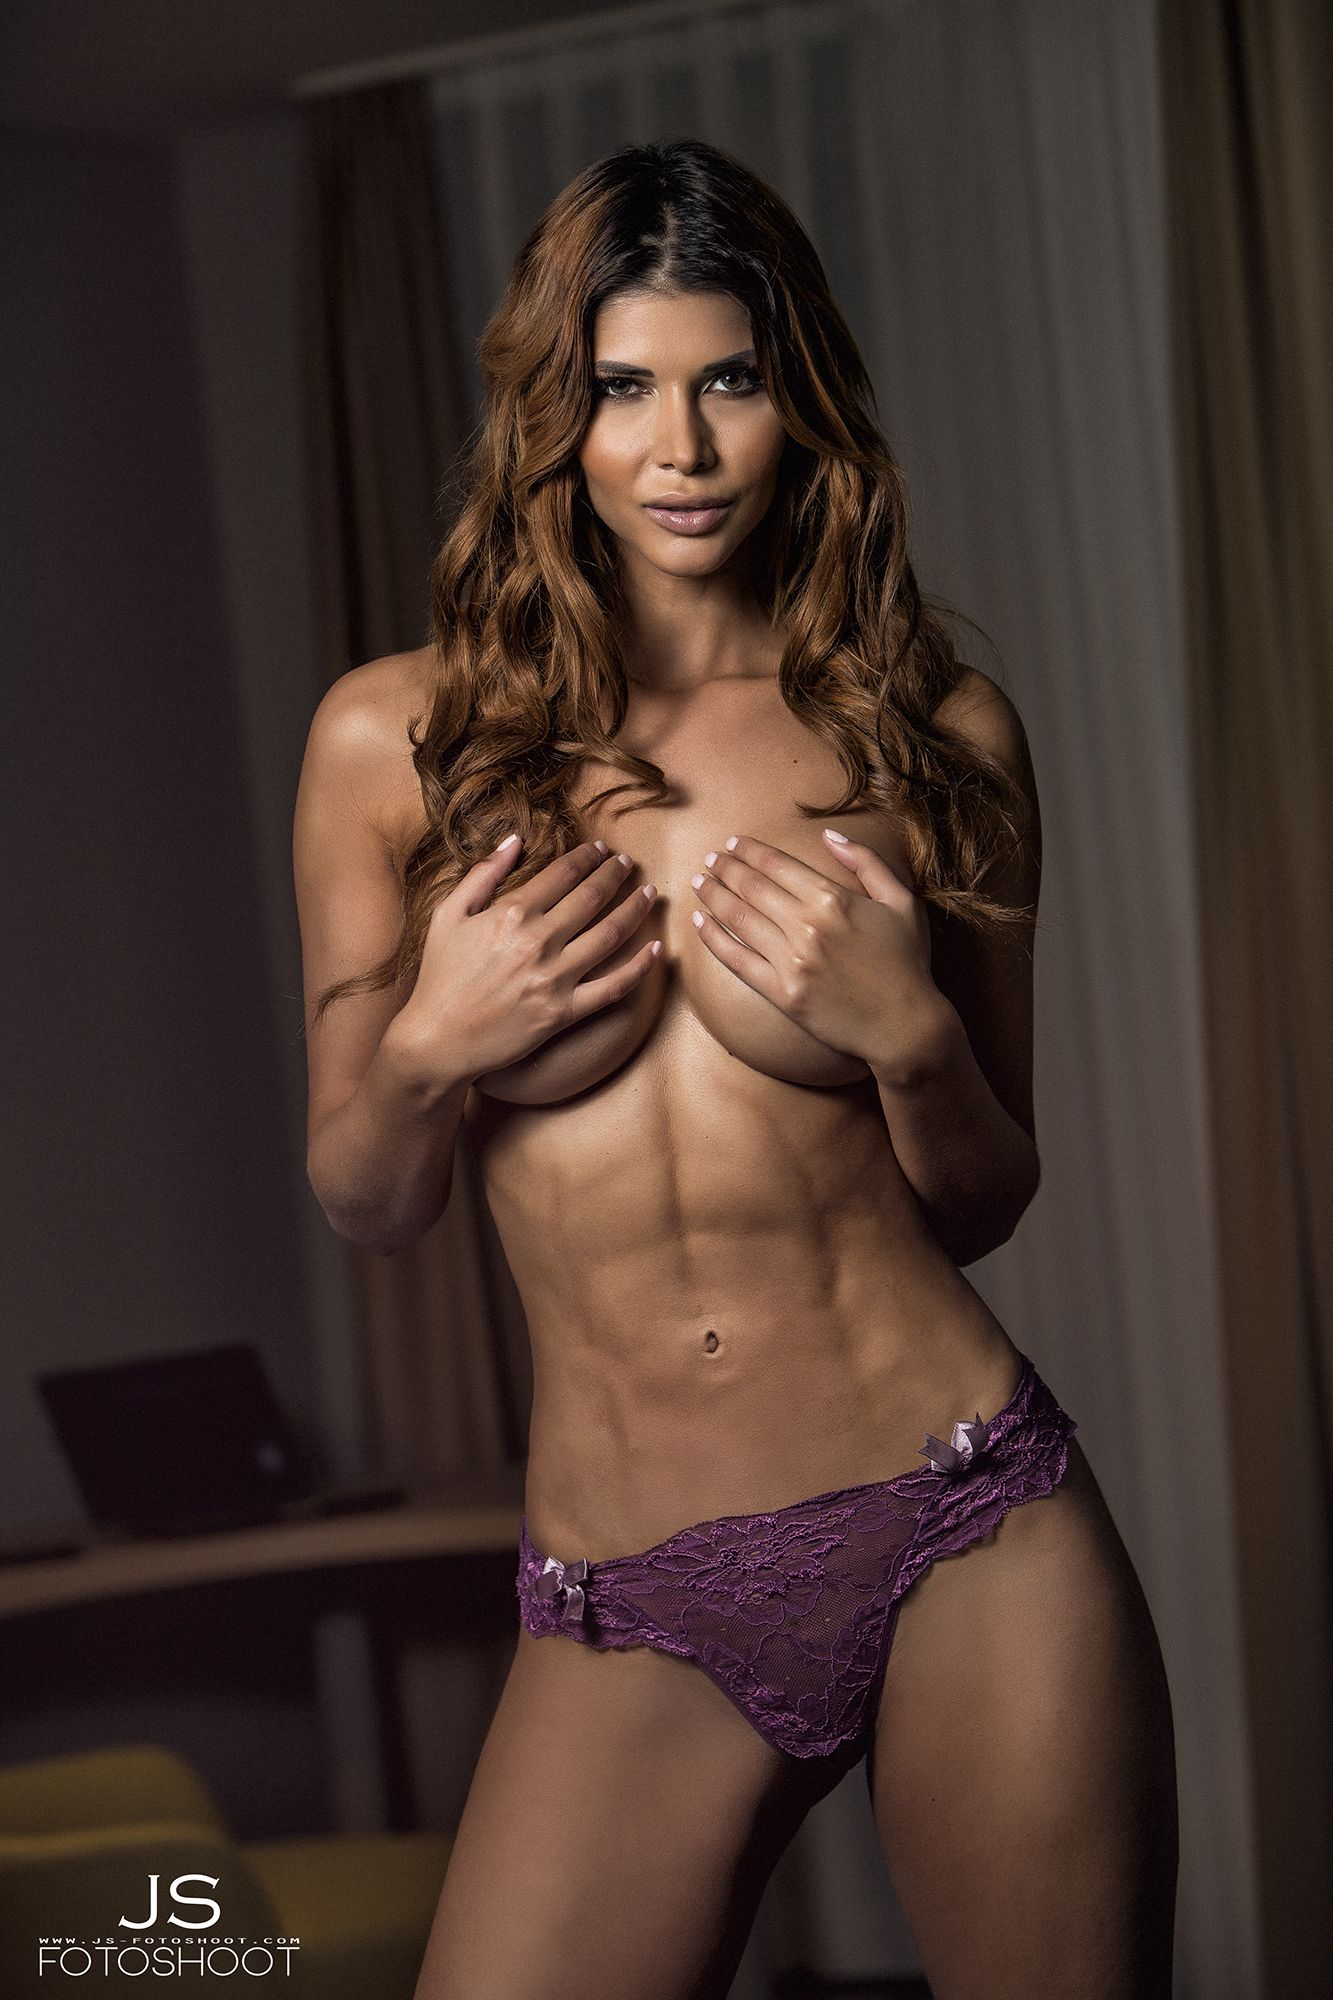 Michaela schäfer porn